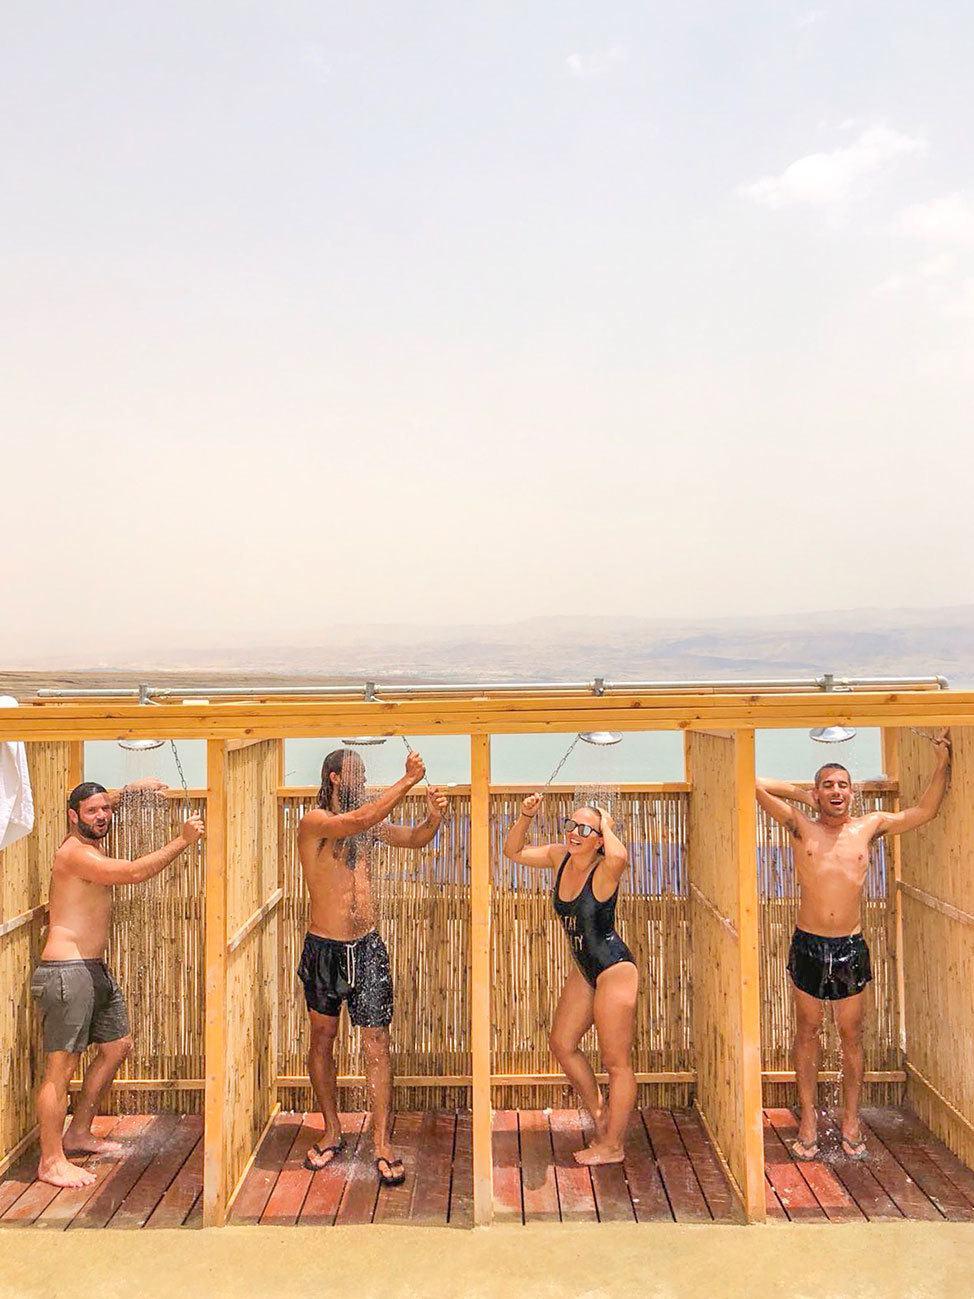 Kalia Beach, Dead Sea, Israel